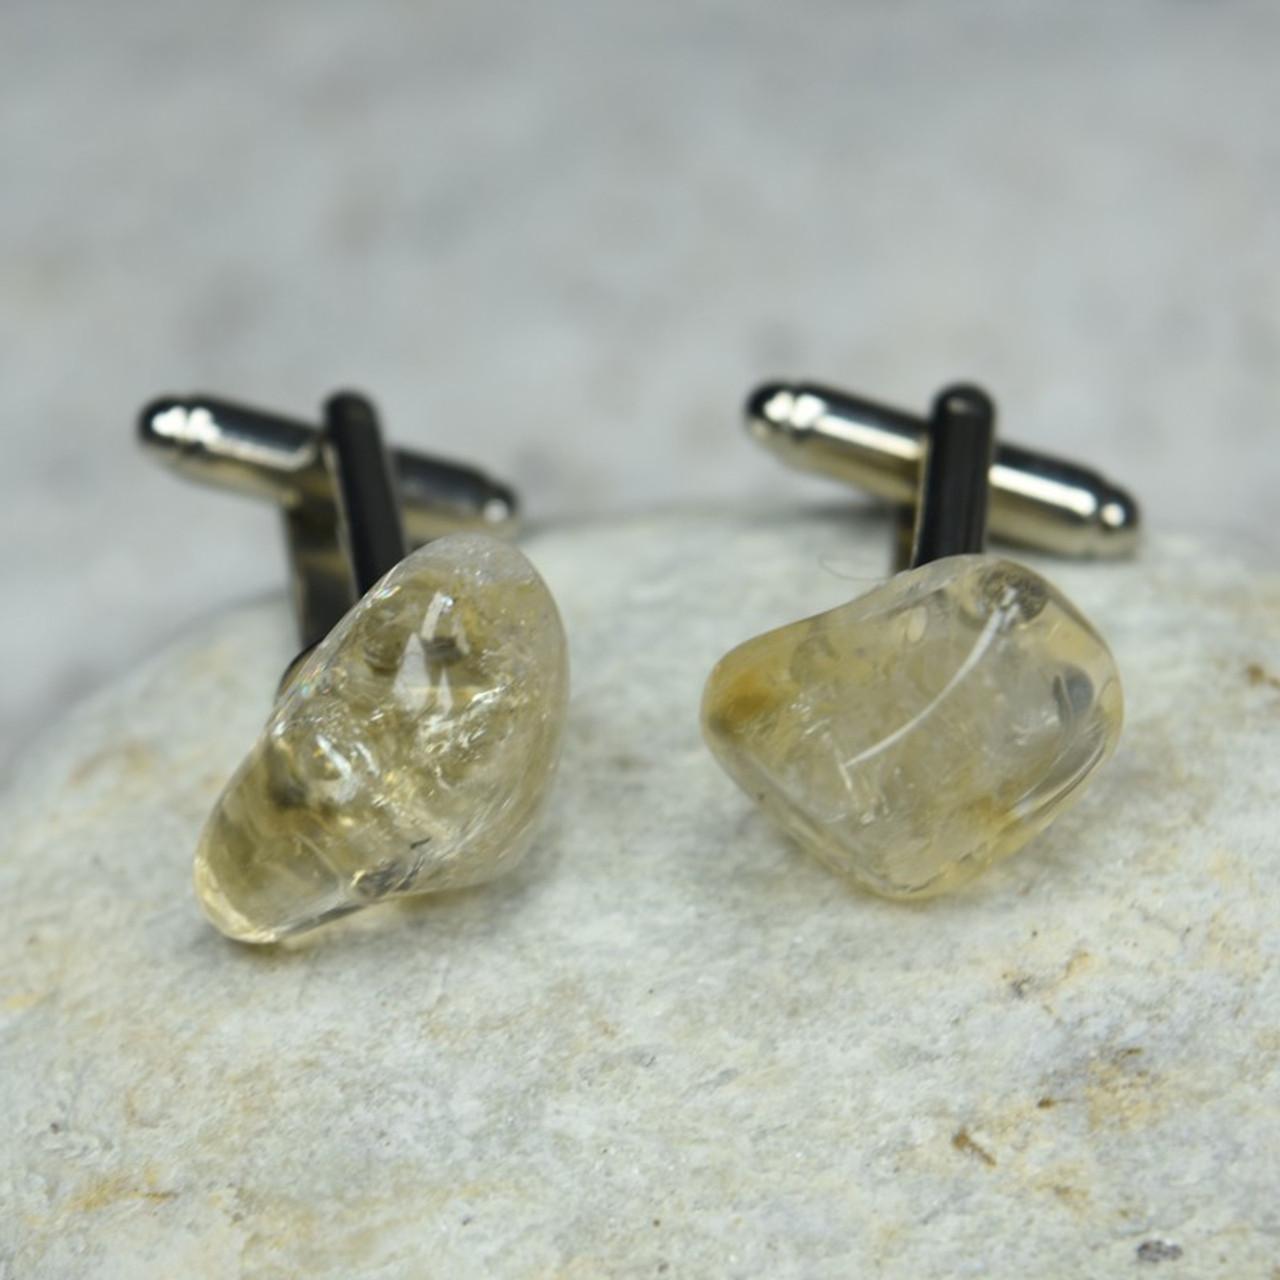 Custom Citrine Stone Cufflinks Handmade - 1 Set